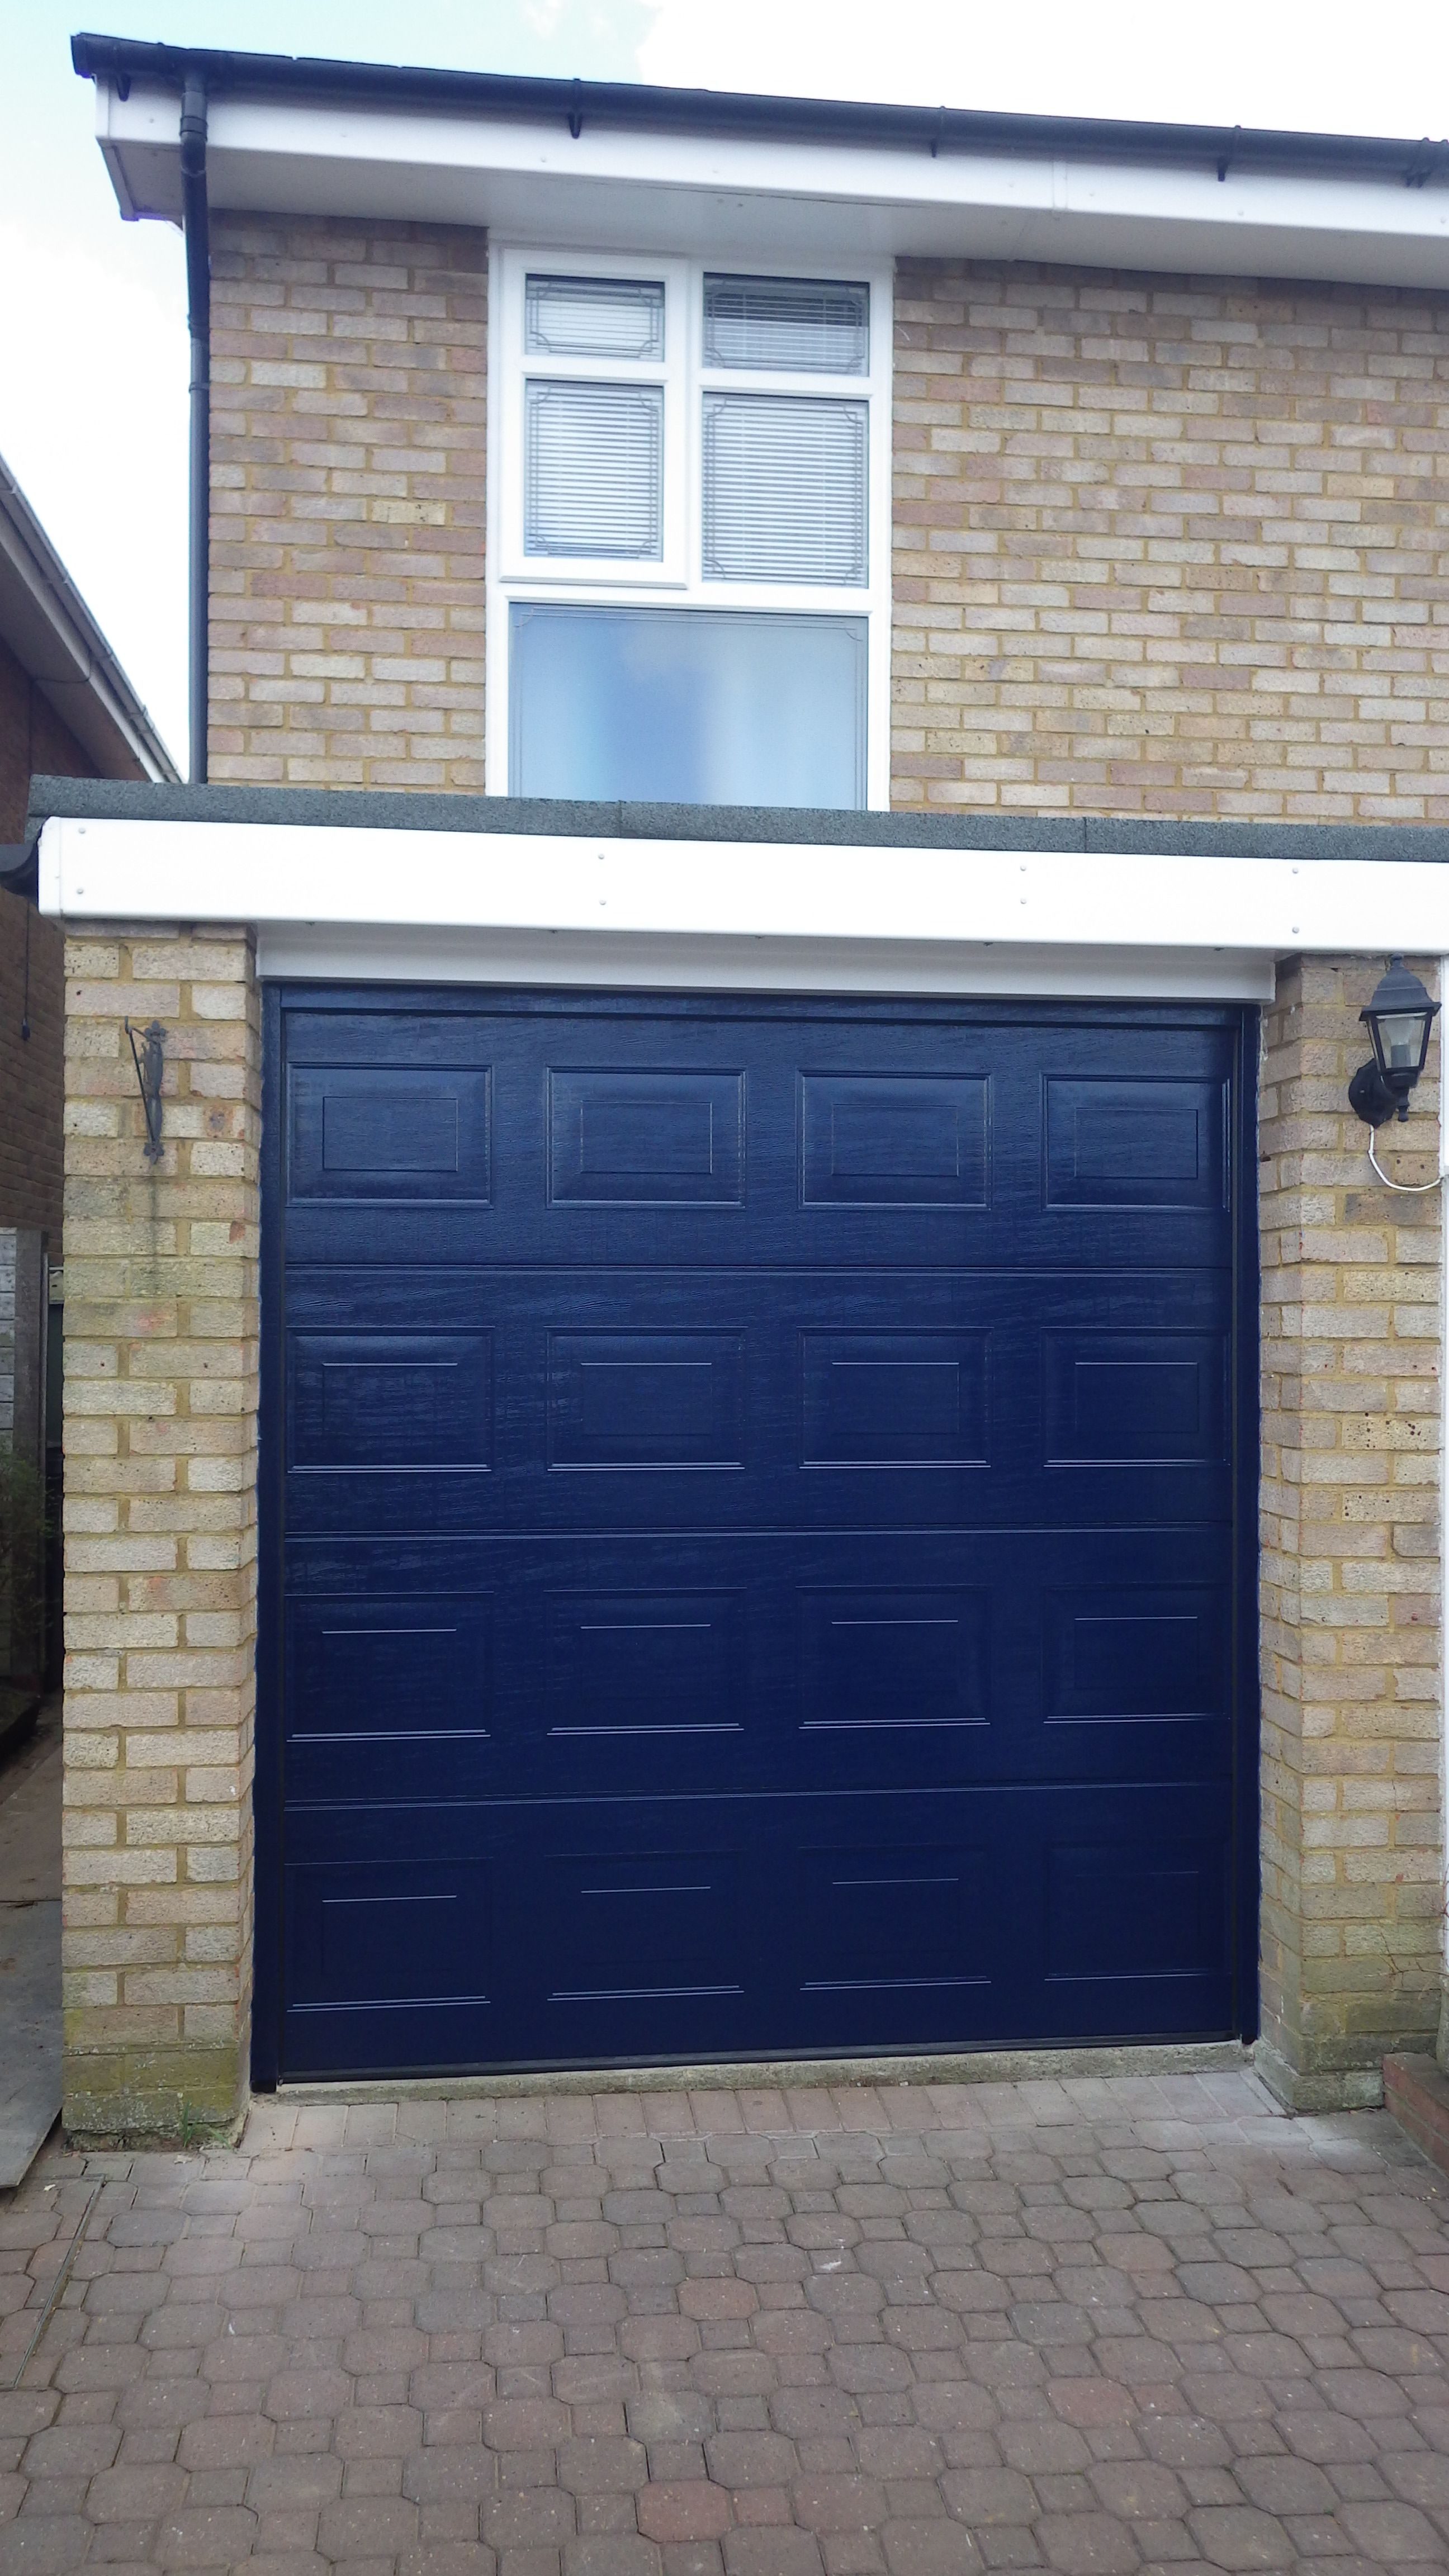 Hormann Sectional S-panelled woodgrain garage door in dark blue. & Hormann Sectional S-panelled woodgrain garage door in dark blue ... pezcame.com